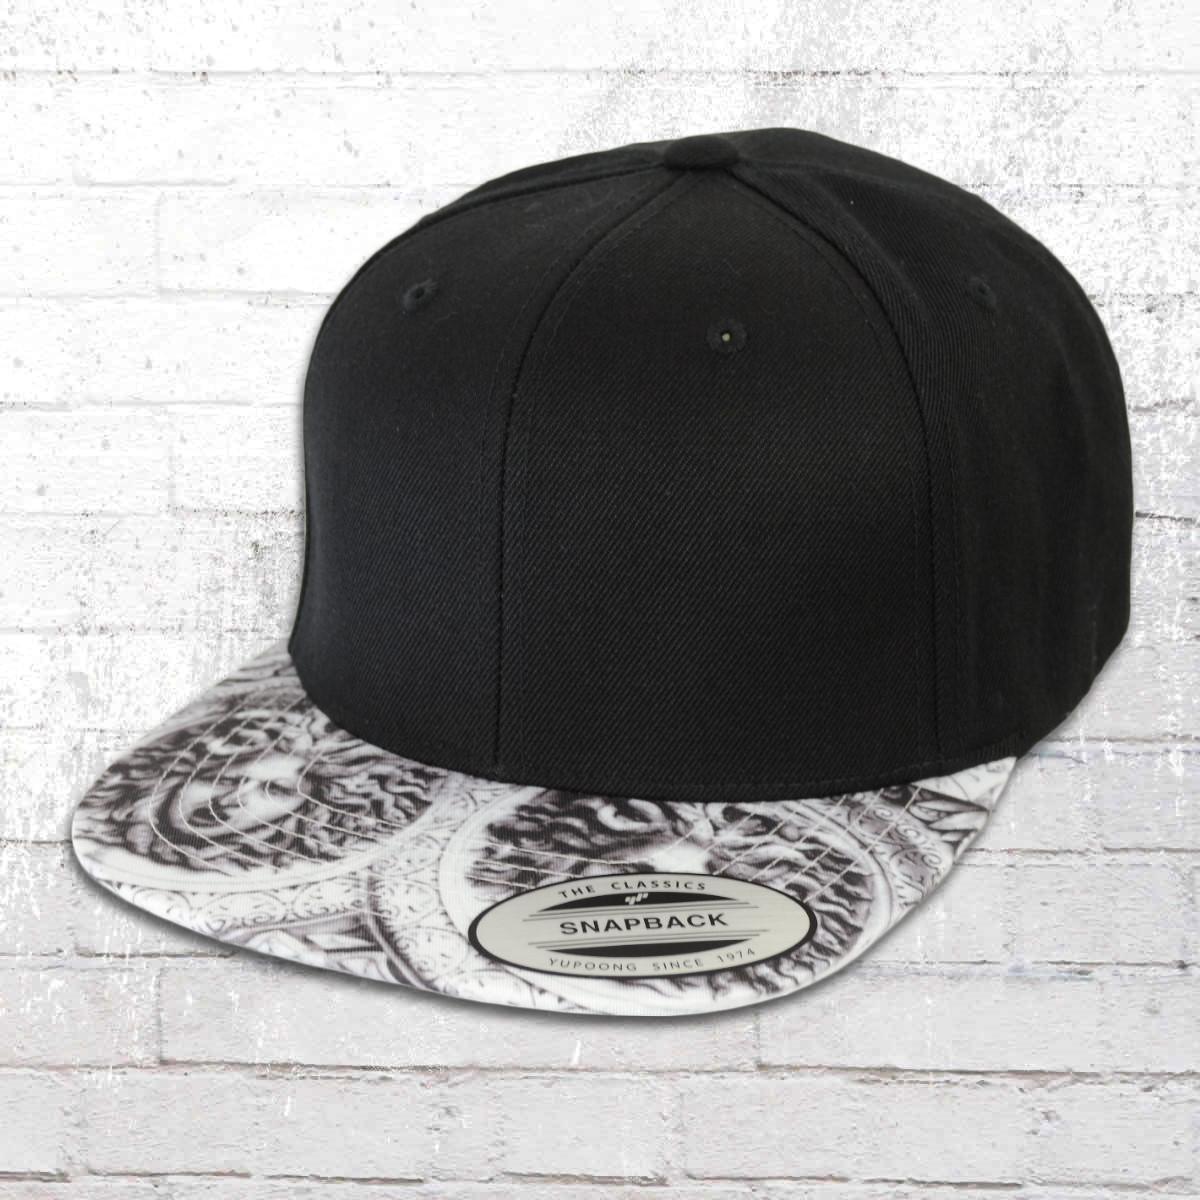 2d6edcf268e Yupoong by Flexfit Hat Sun King Snapback Cap schwarz weiss. ›‹ «